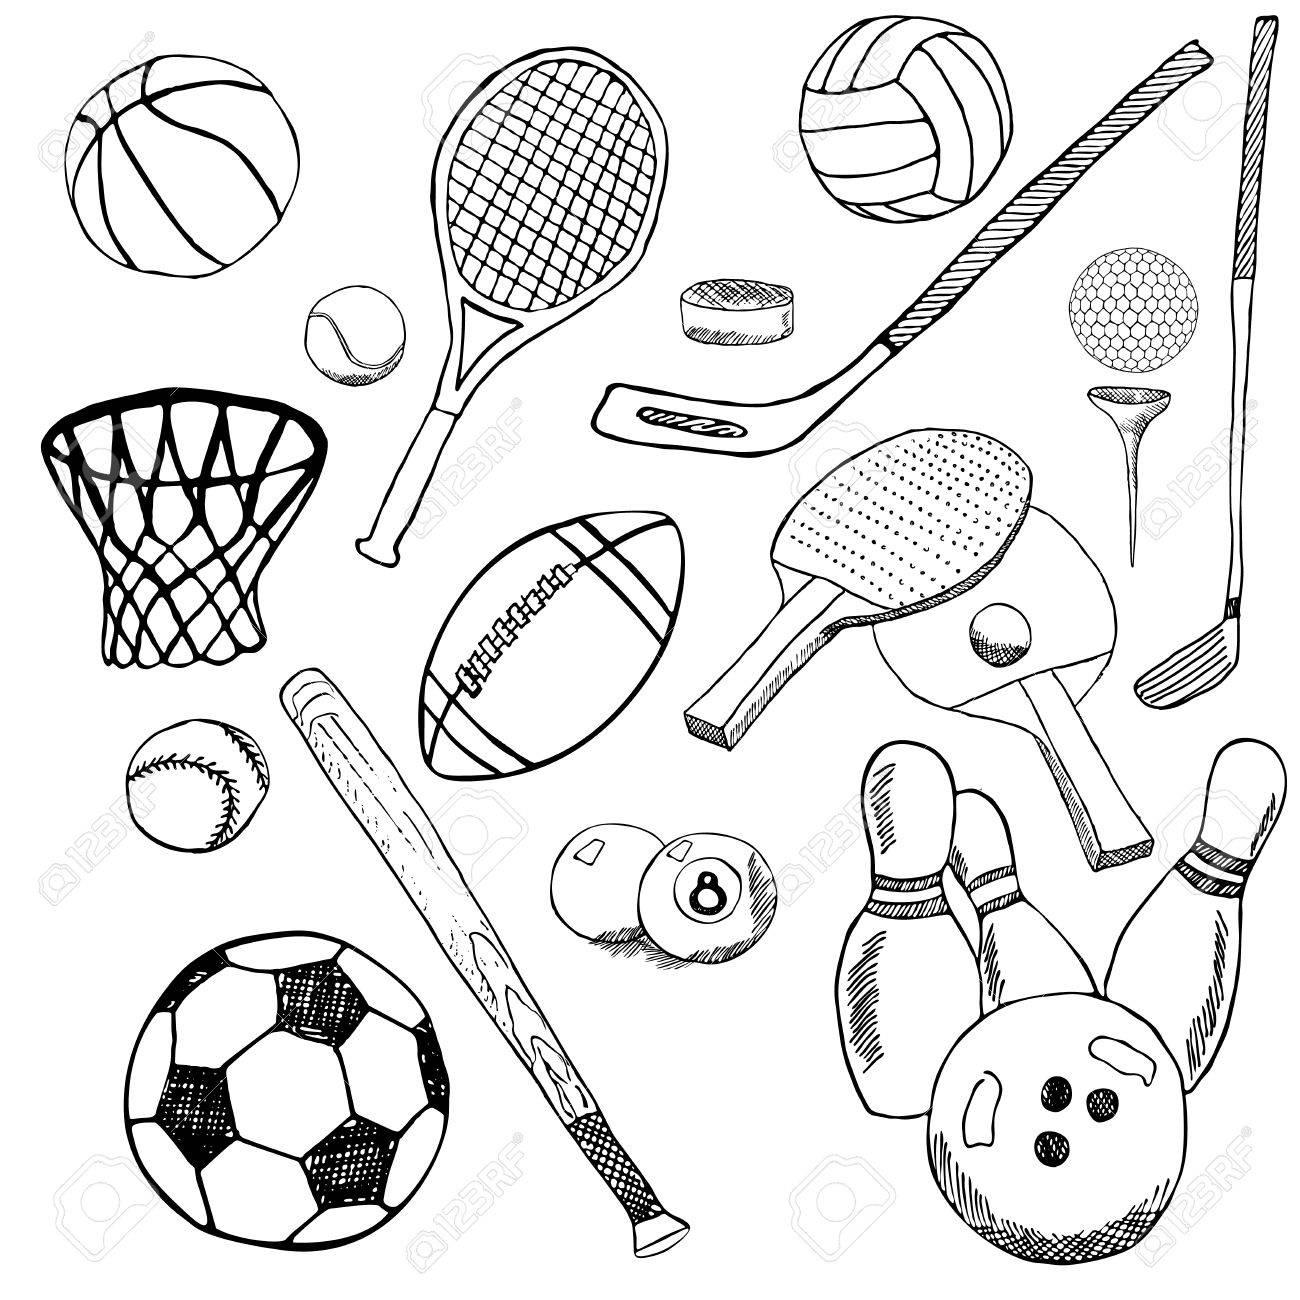 sport balls hand drawn sketch set with baseball bowling tennis football golf balls